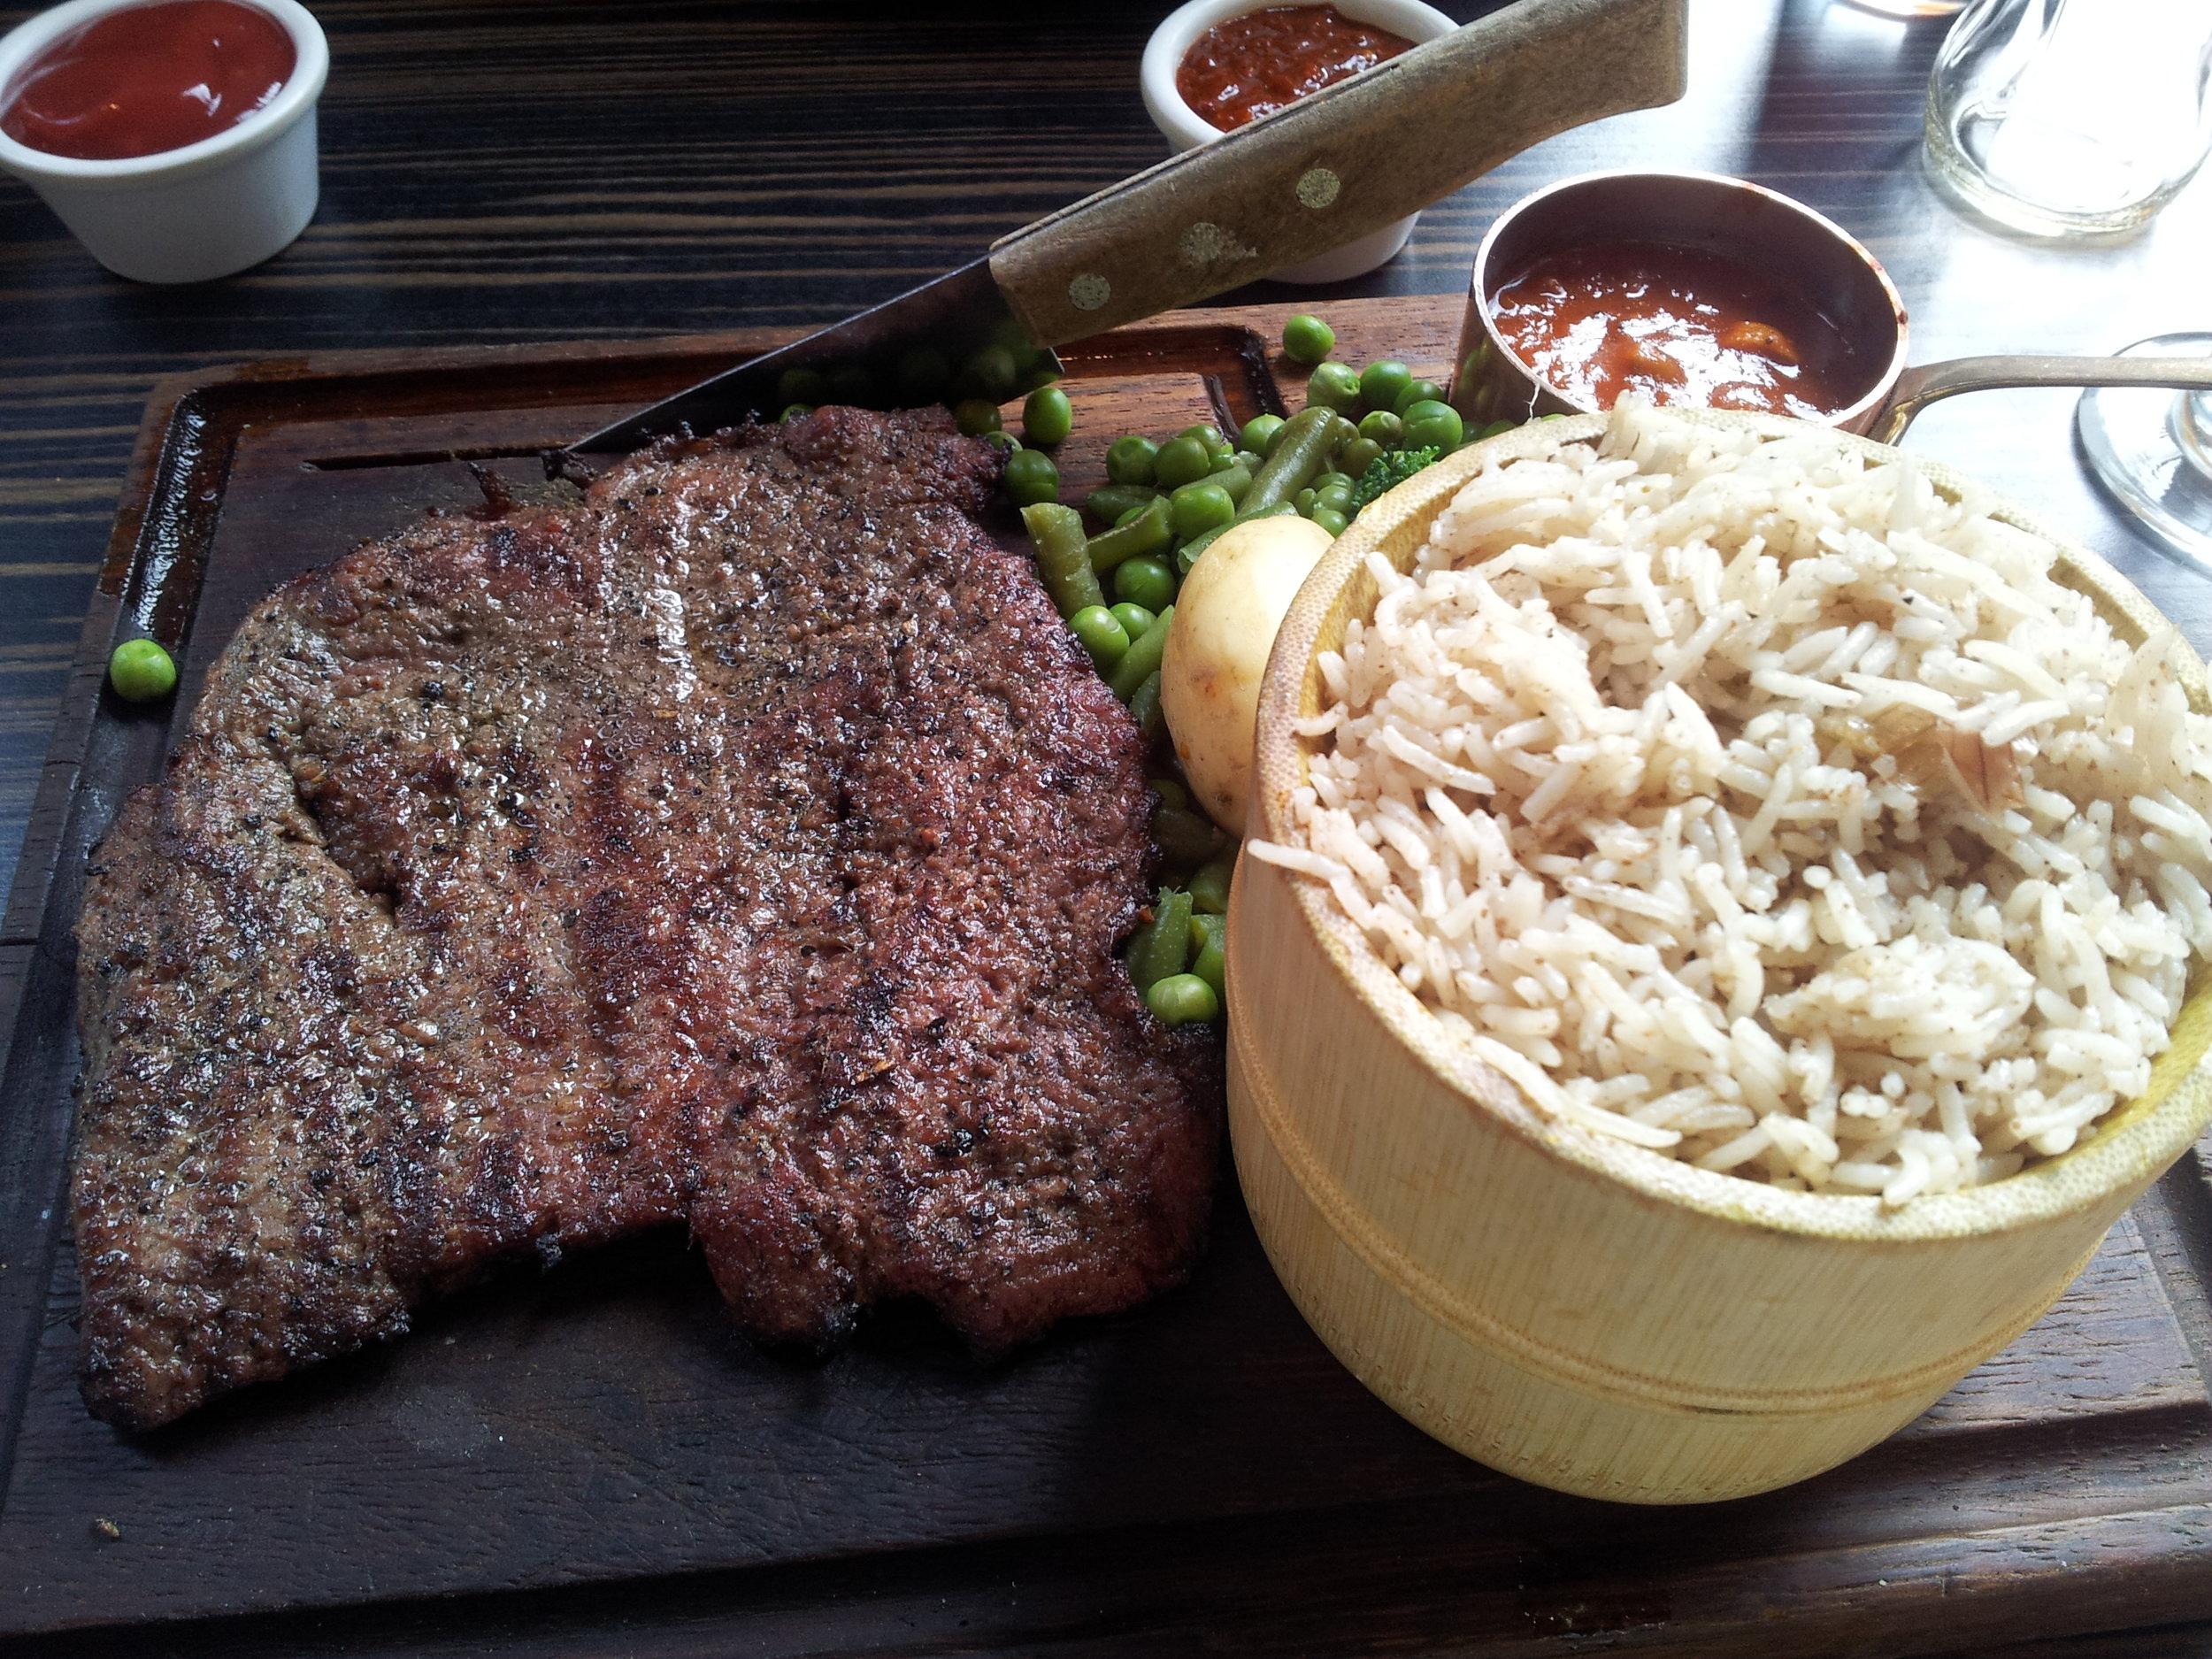 Halal Steak at Zouk Manchester